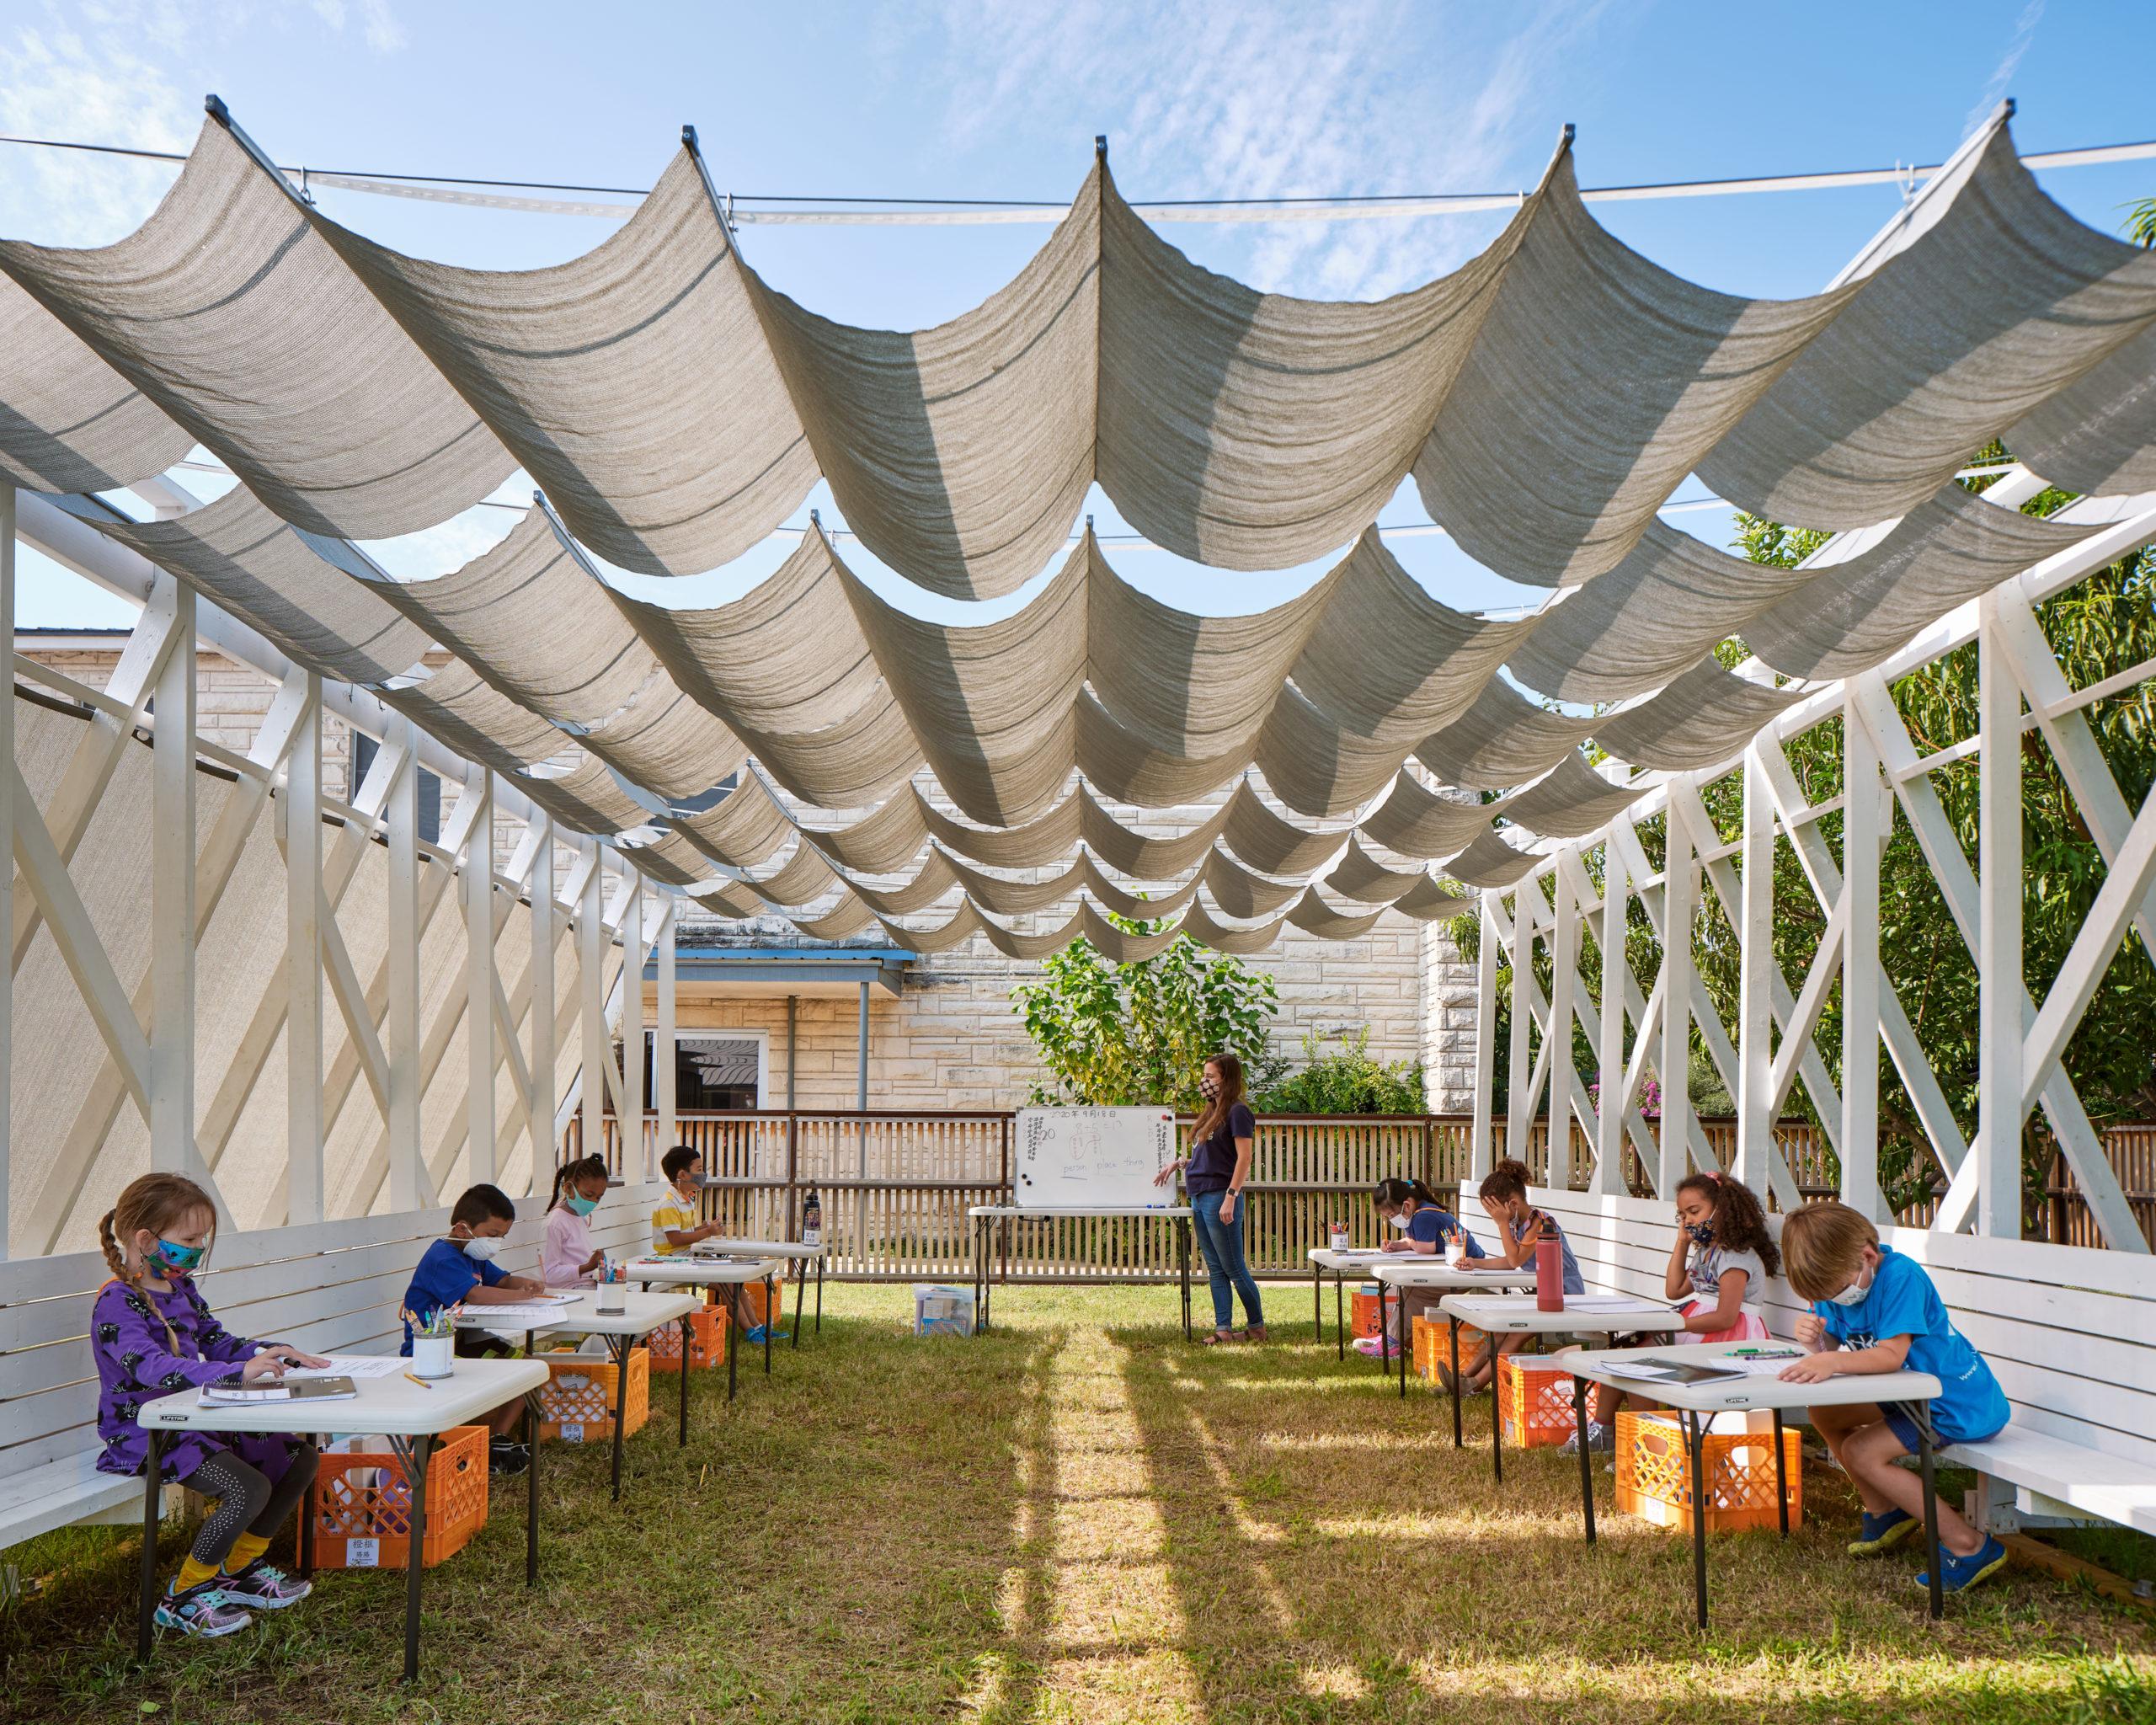 Salle de classe Pergola temporaire Tiger Covid par Murray Legge Architecture, Austin, Texus